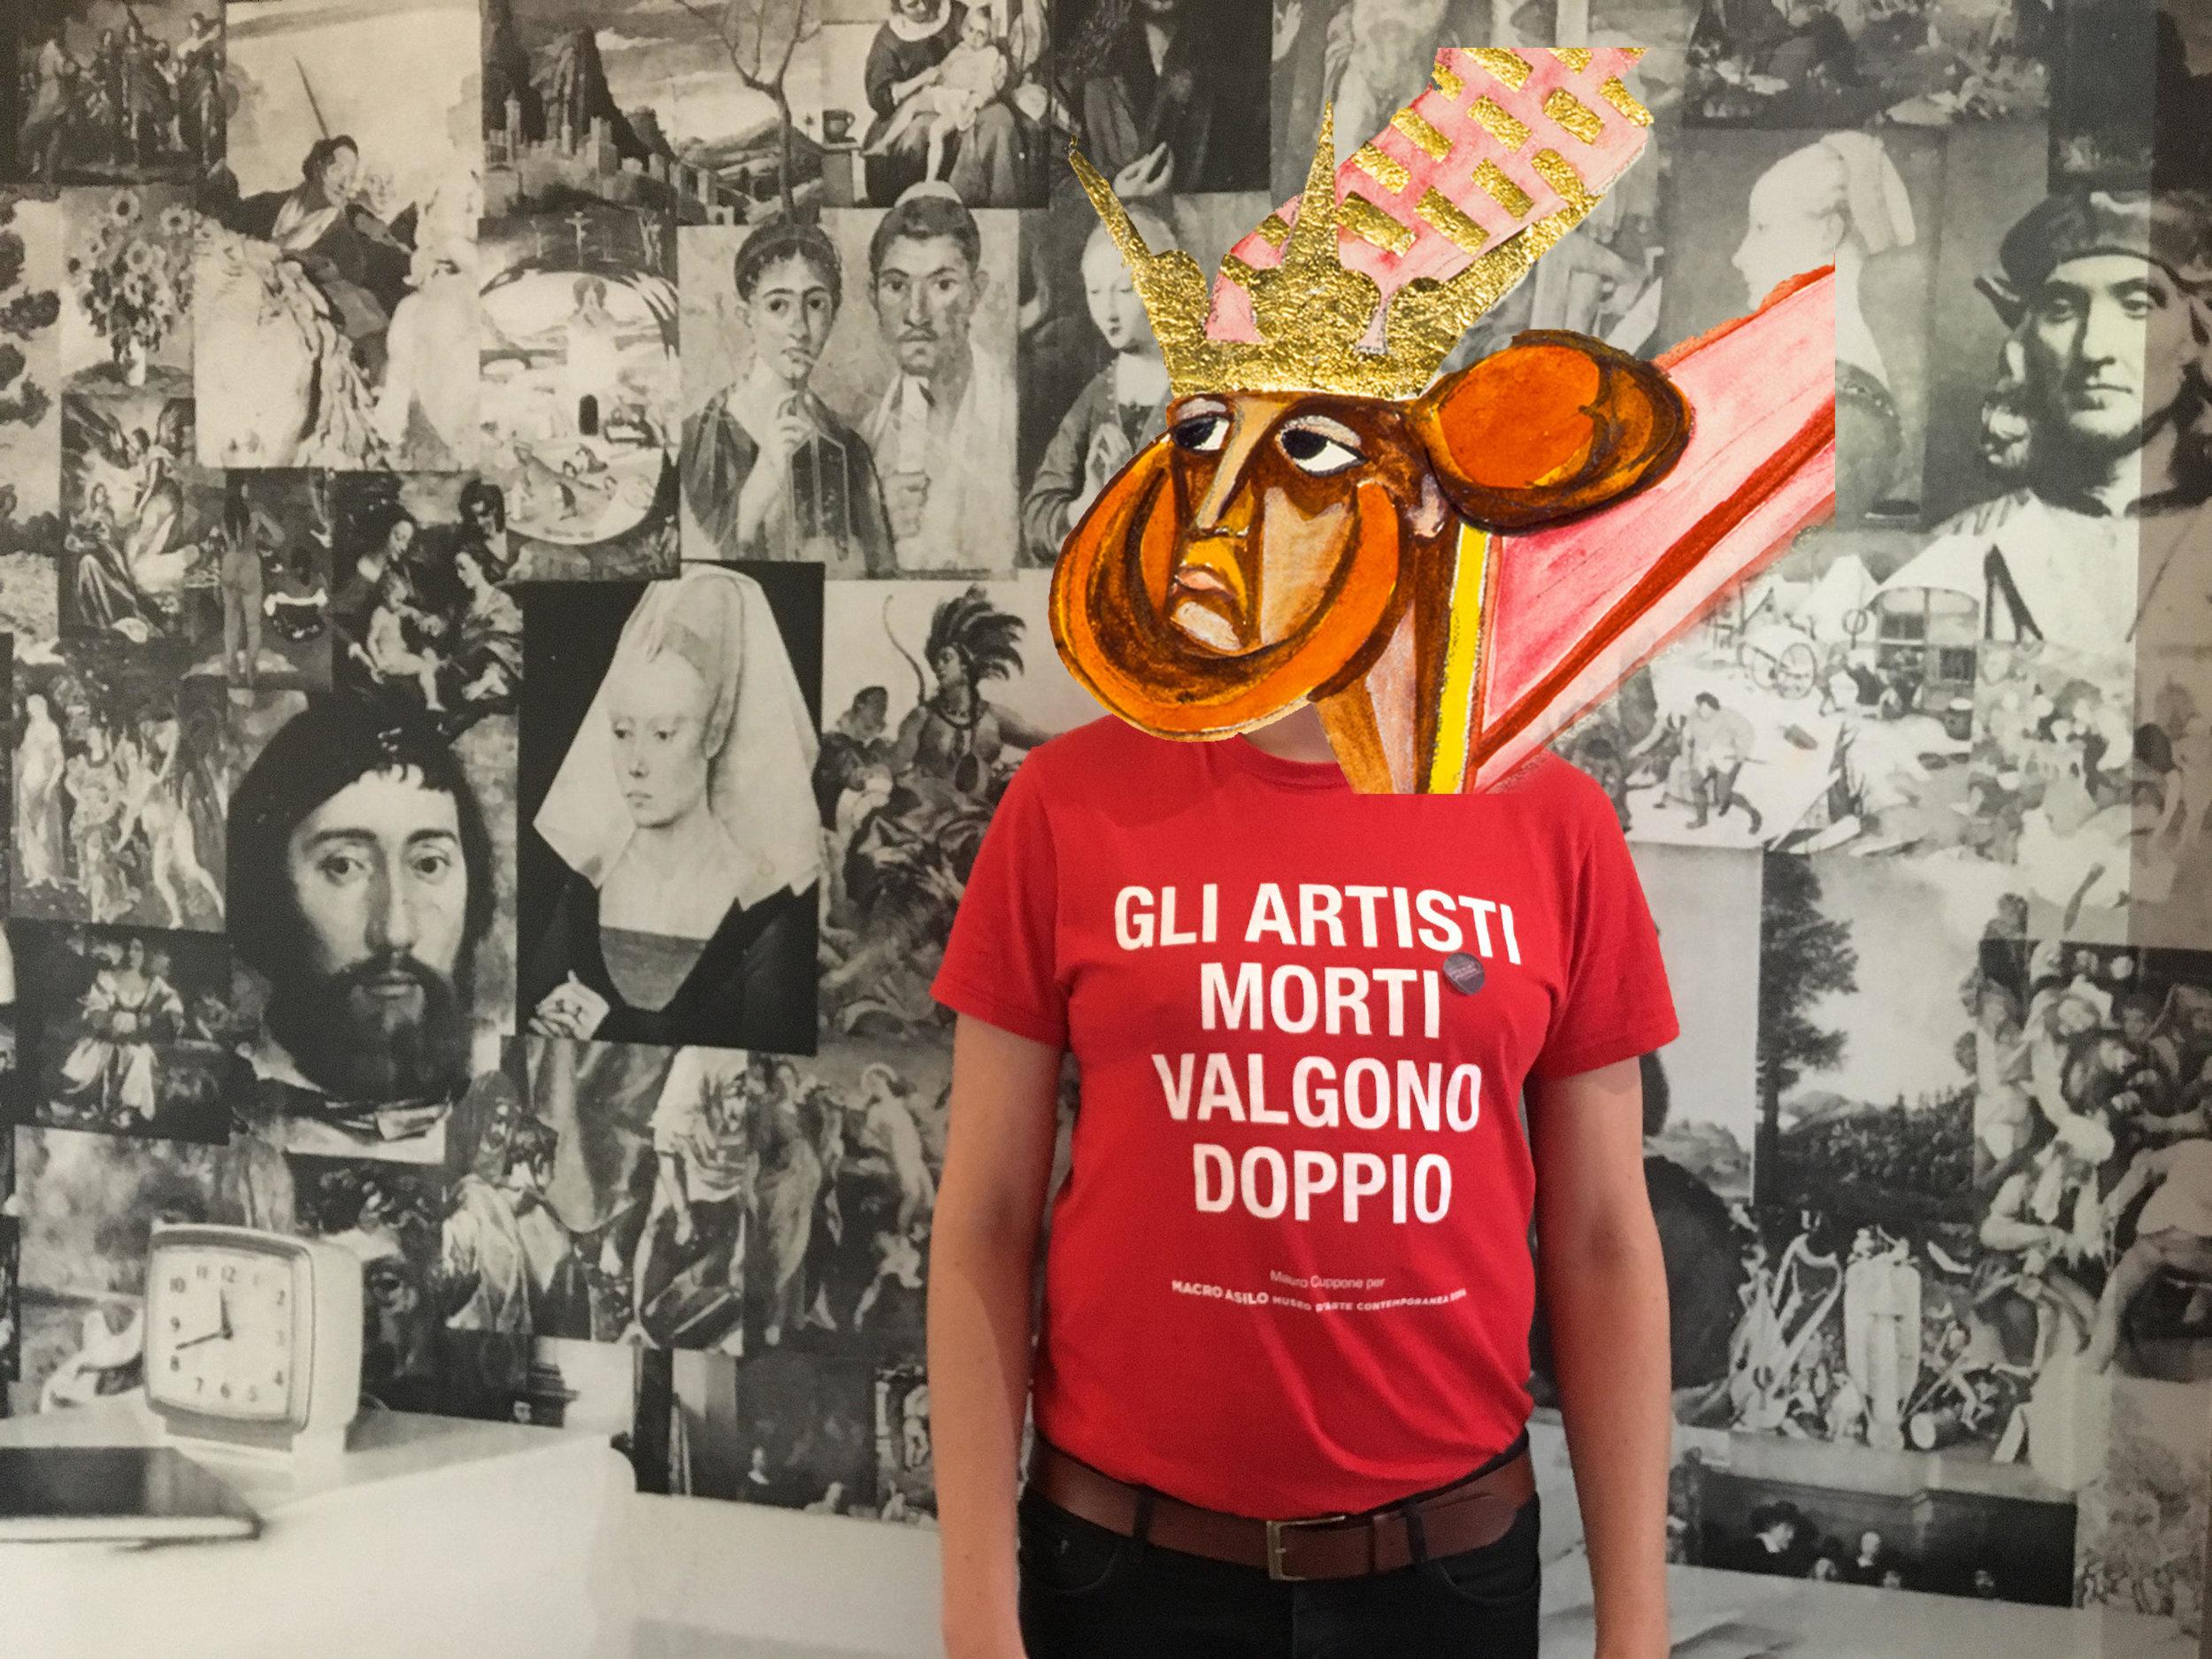 Greg Thorpe and Oisin Share, Greg in Joe Orton's flat with Goncharova's head (2019). Digital collage